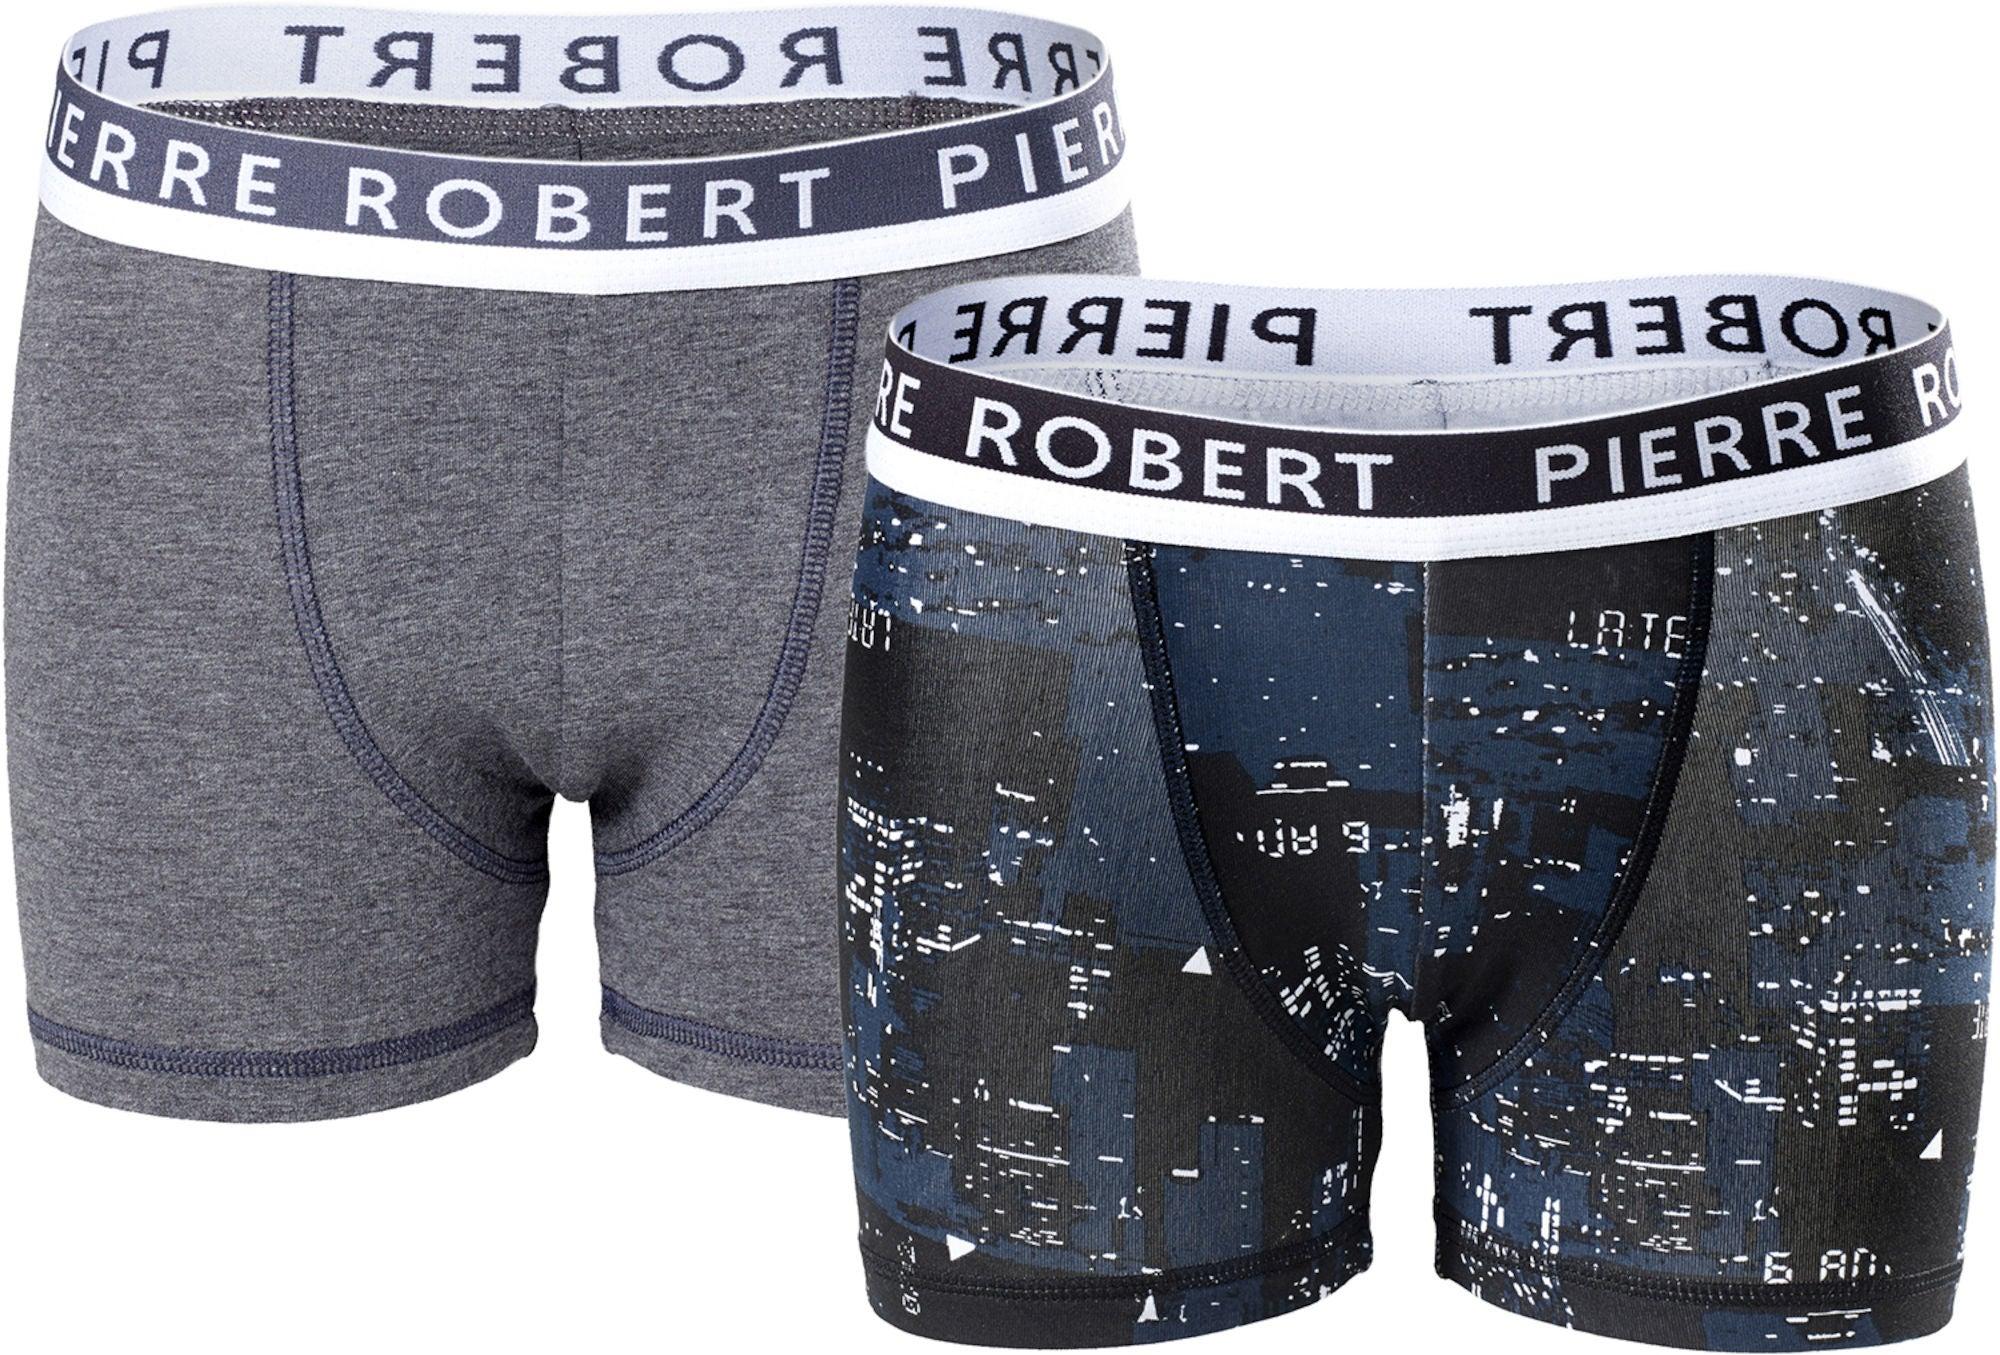 Pierre Robert Kalsong 2-Pack, Black/Grey 158 -164